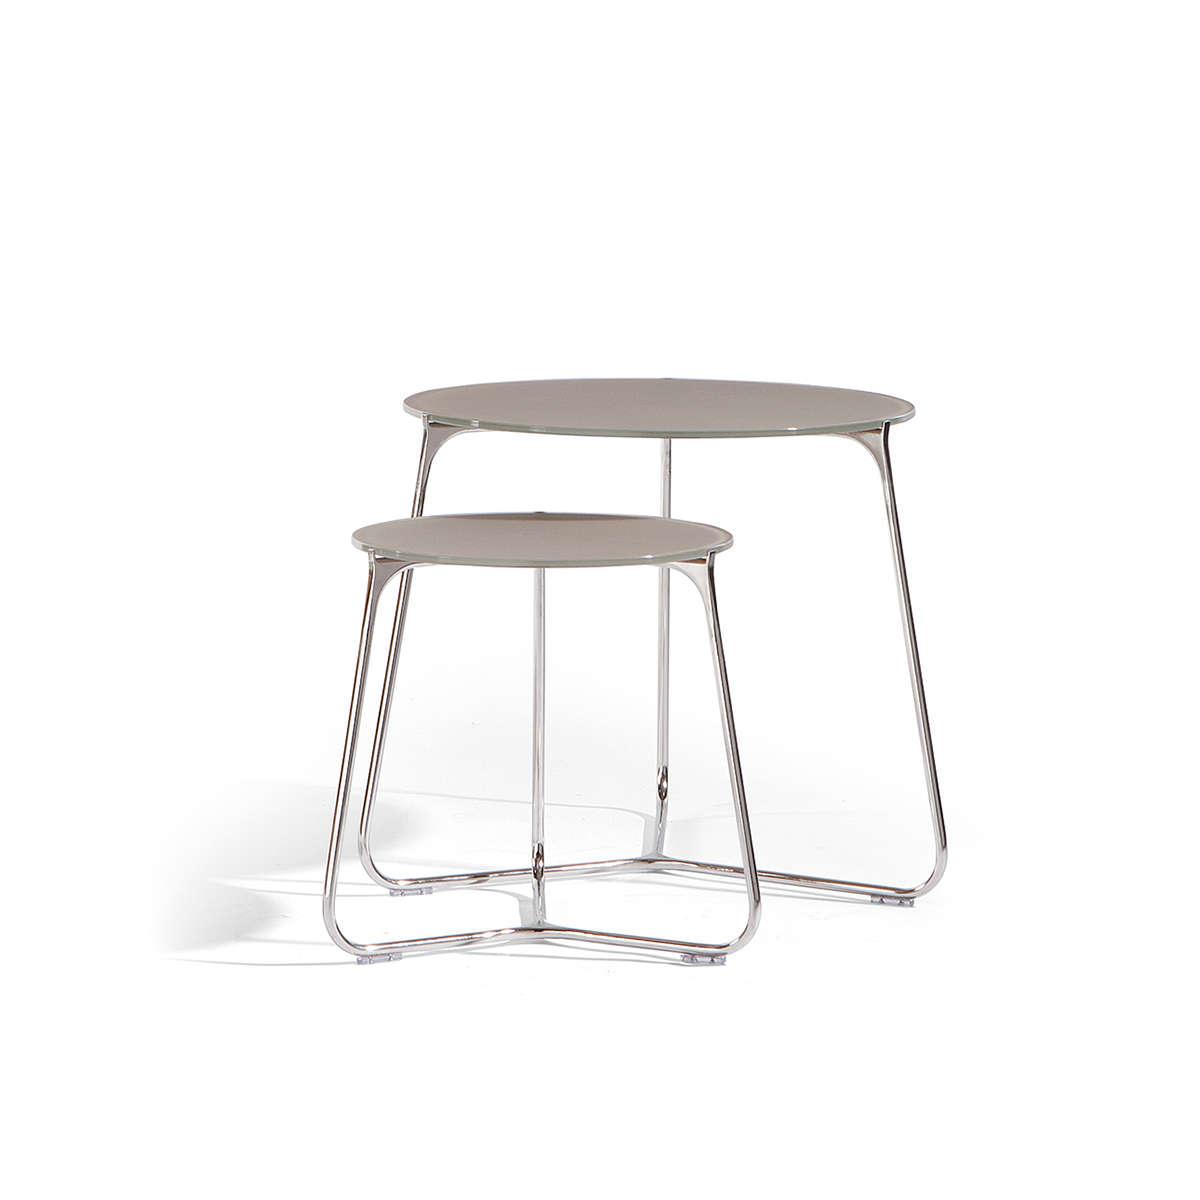 Mood Lounge Table